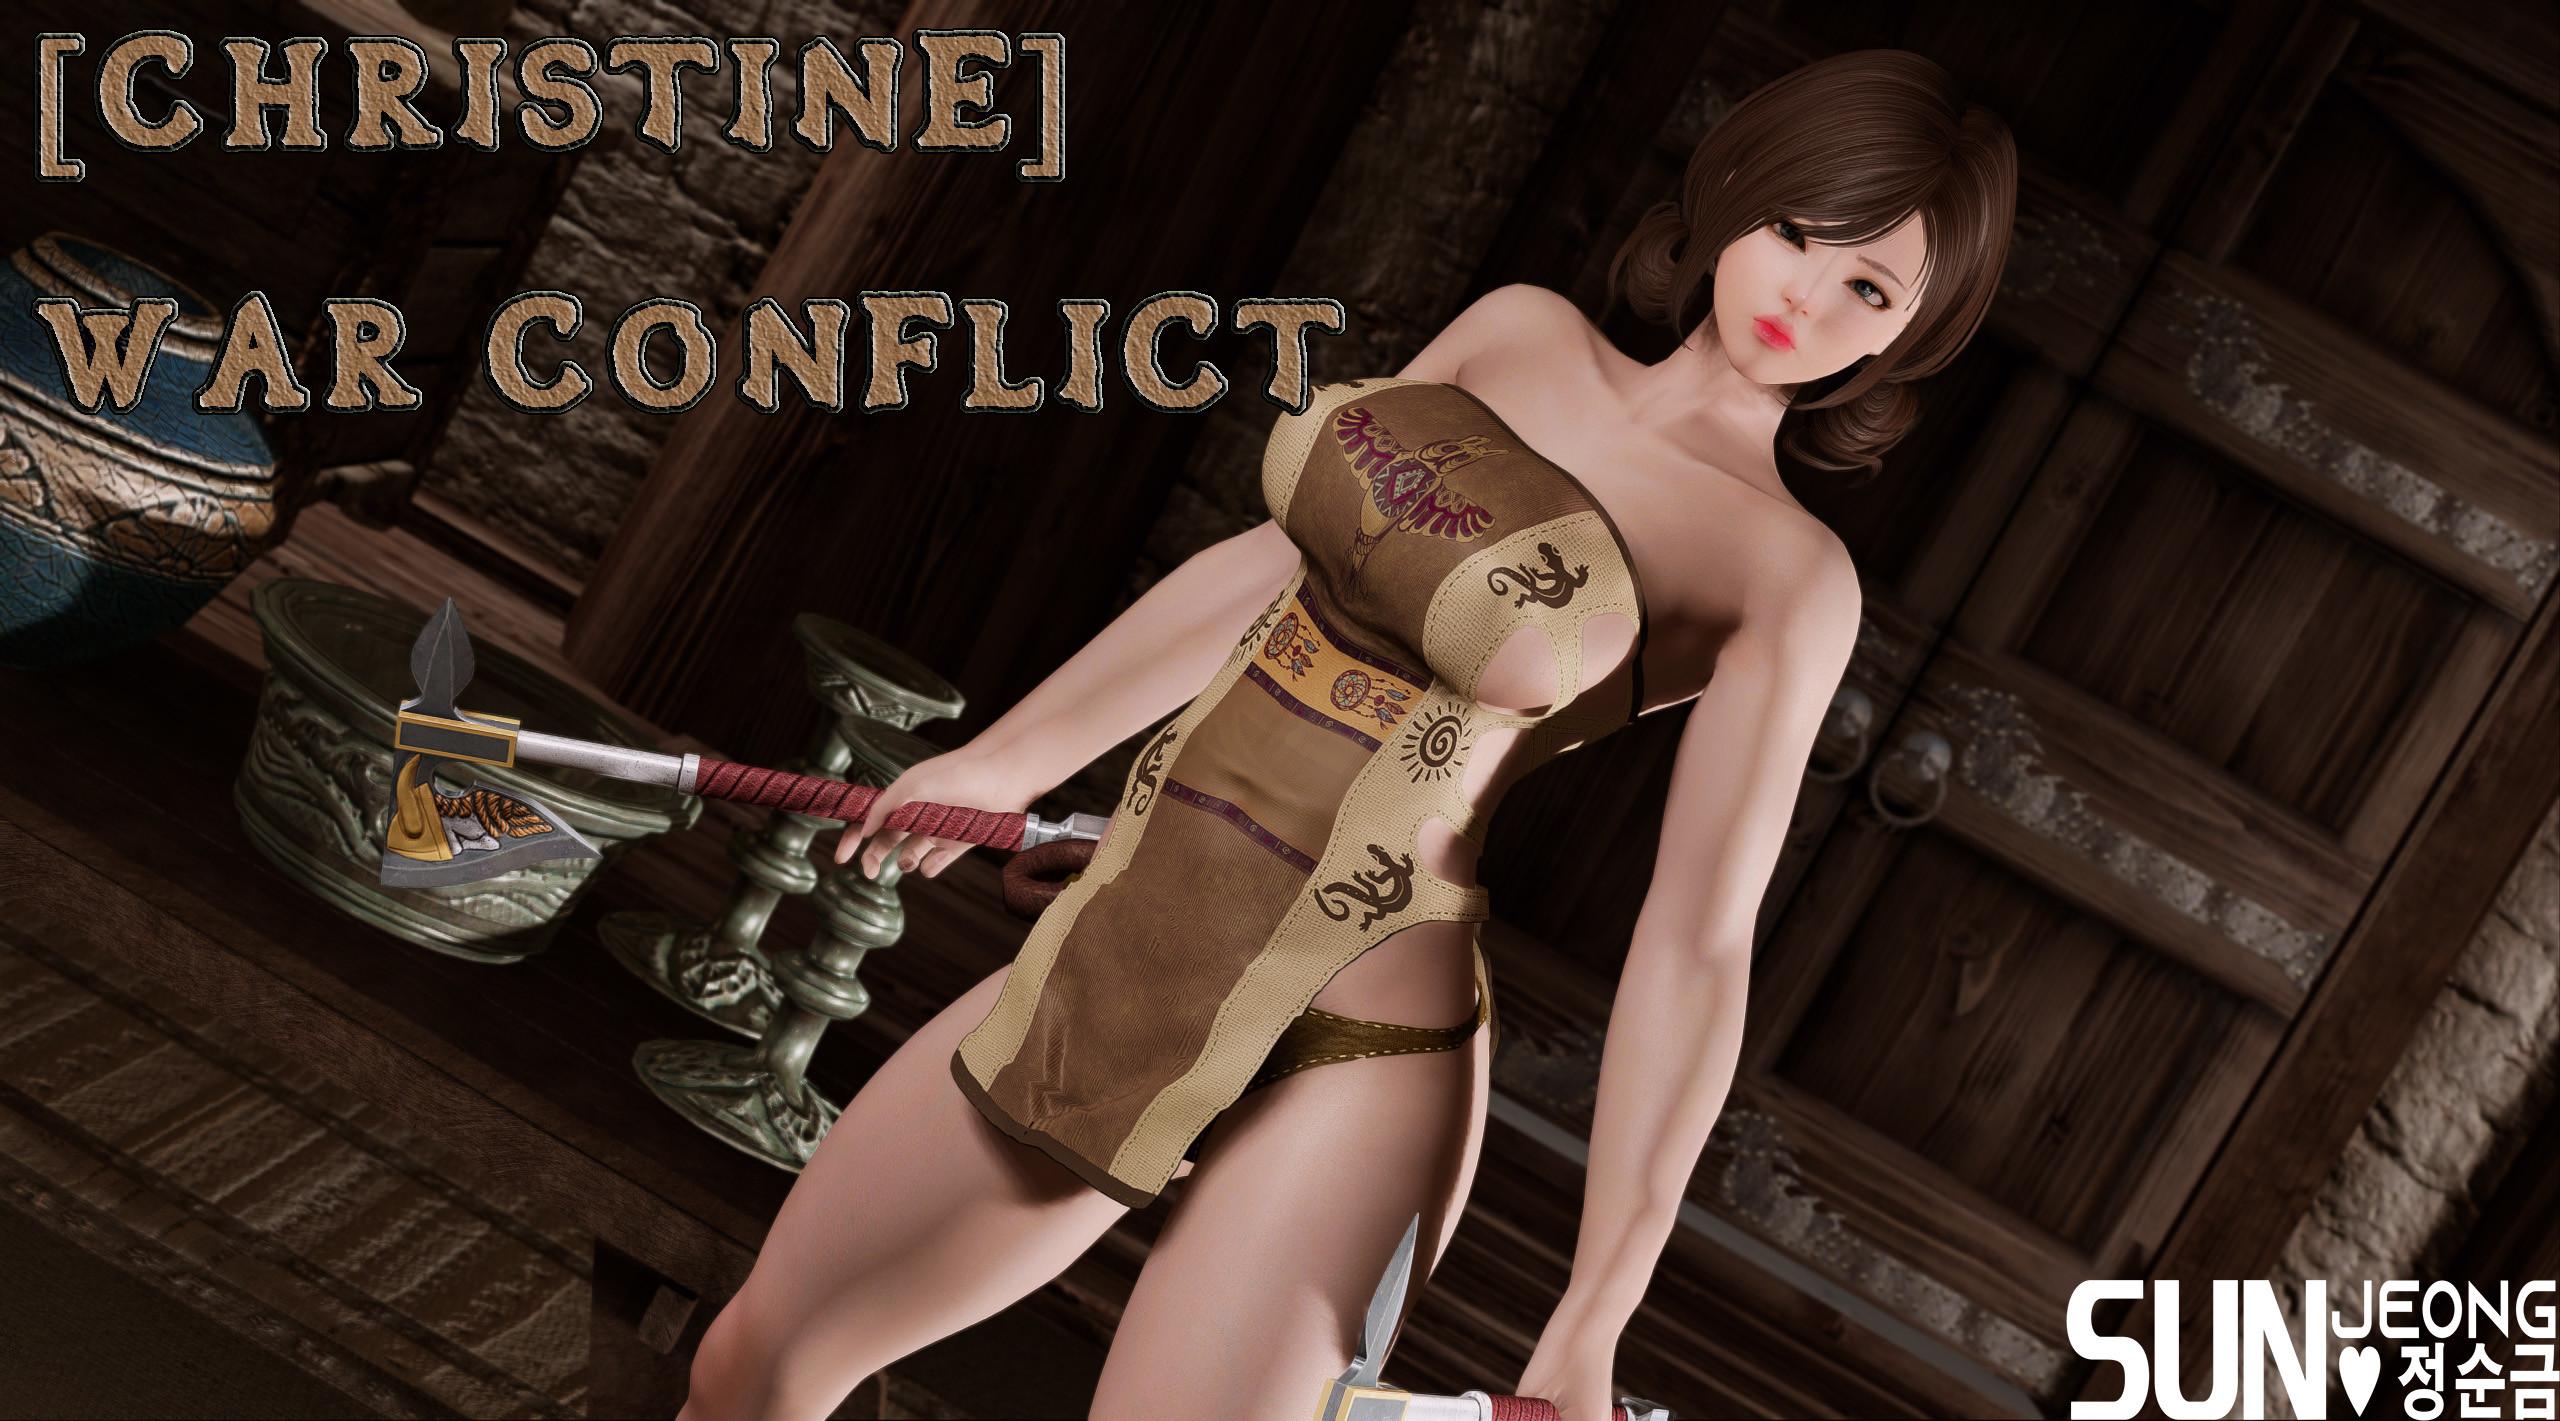 [Christine] War Conlfict